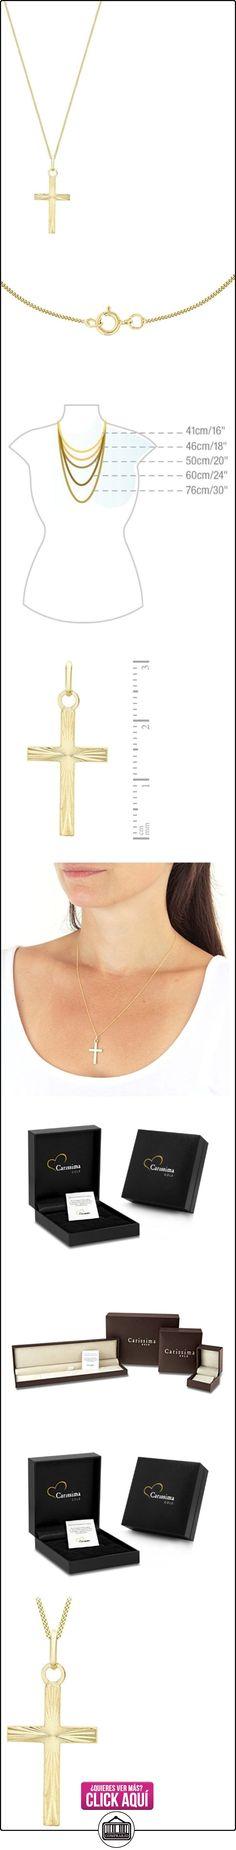 Carissima Gold Collar unisex con oro amarillo de 9 quilates (375/1000), 46 cm  ✿ Joyas para mujer - Las mejores ofertas ✿ ▬► Ver oferta: https://comprar.io/goto/B0051SMG1M